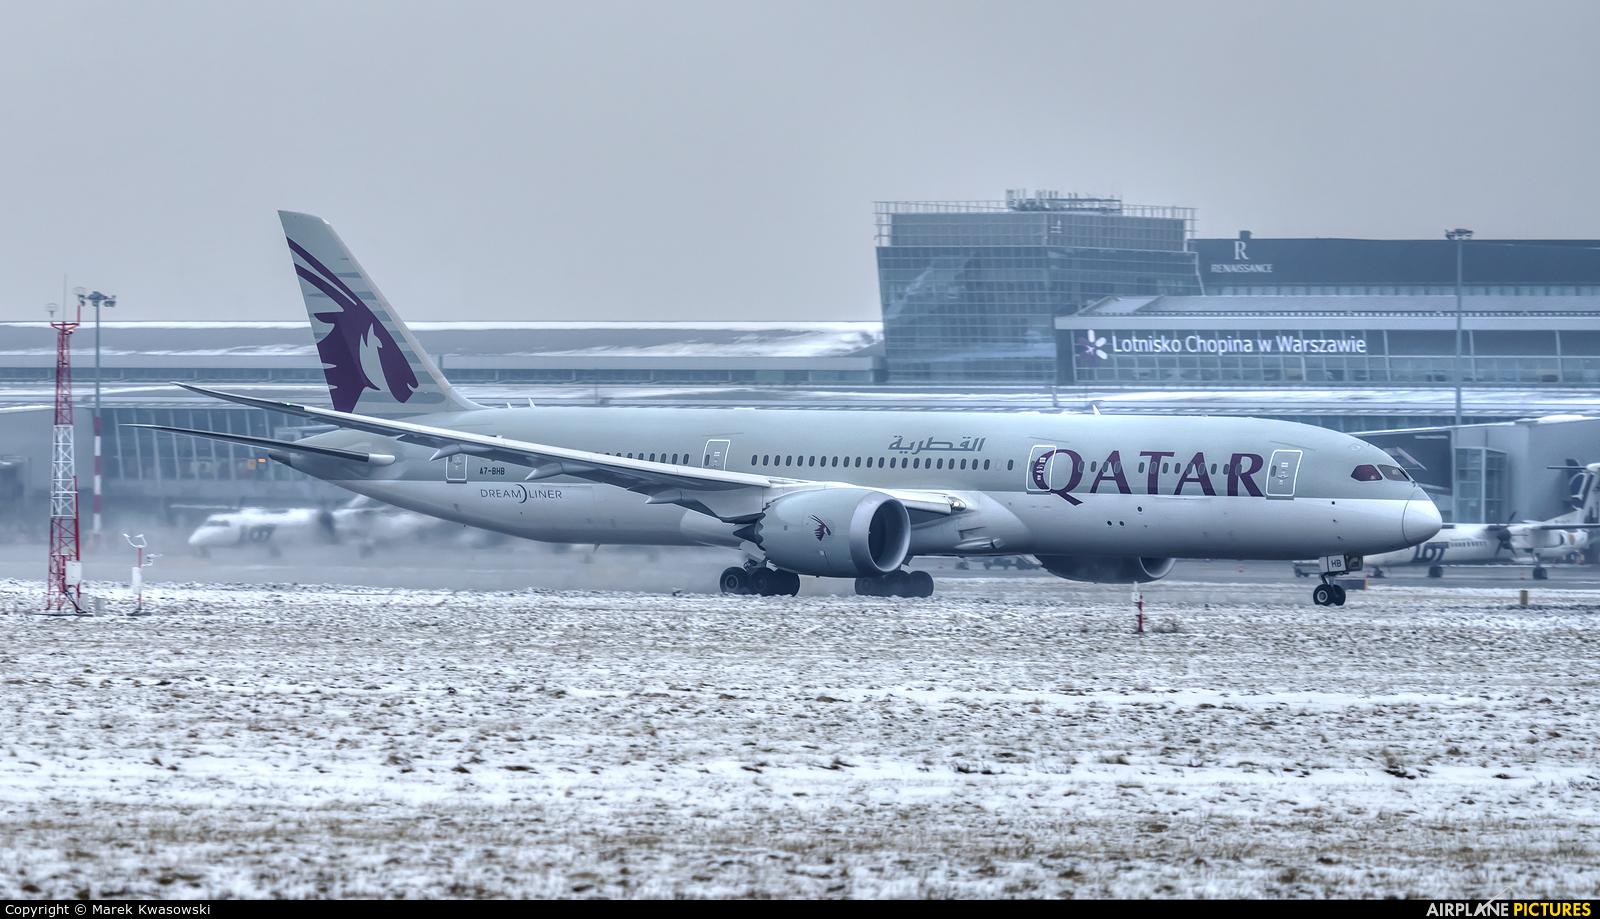 Qatar Airways A7-BHB aircraft at Warsaw - Frederic Chopin